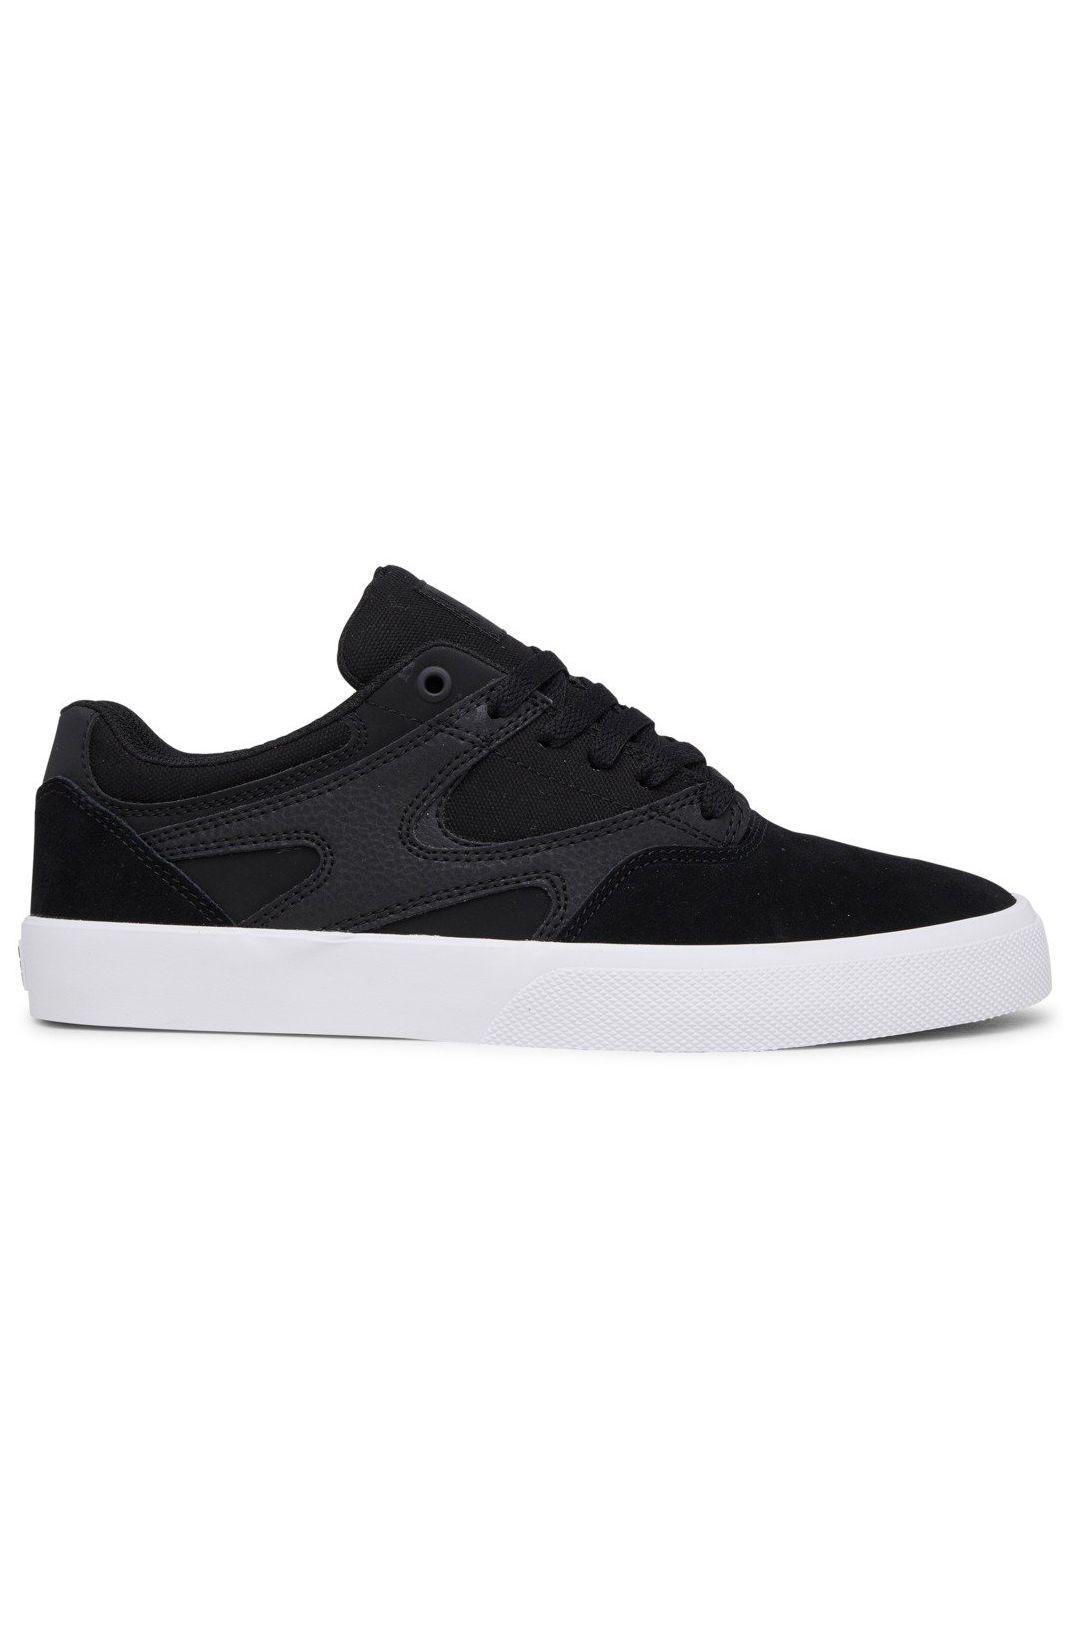 DC Shoes Shoes KALIS VULC S Black/Black/White